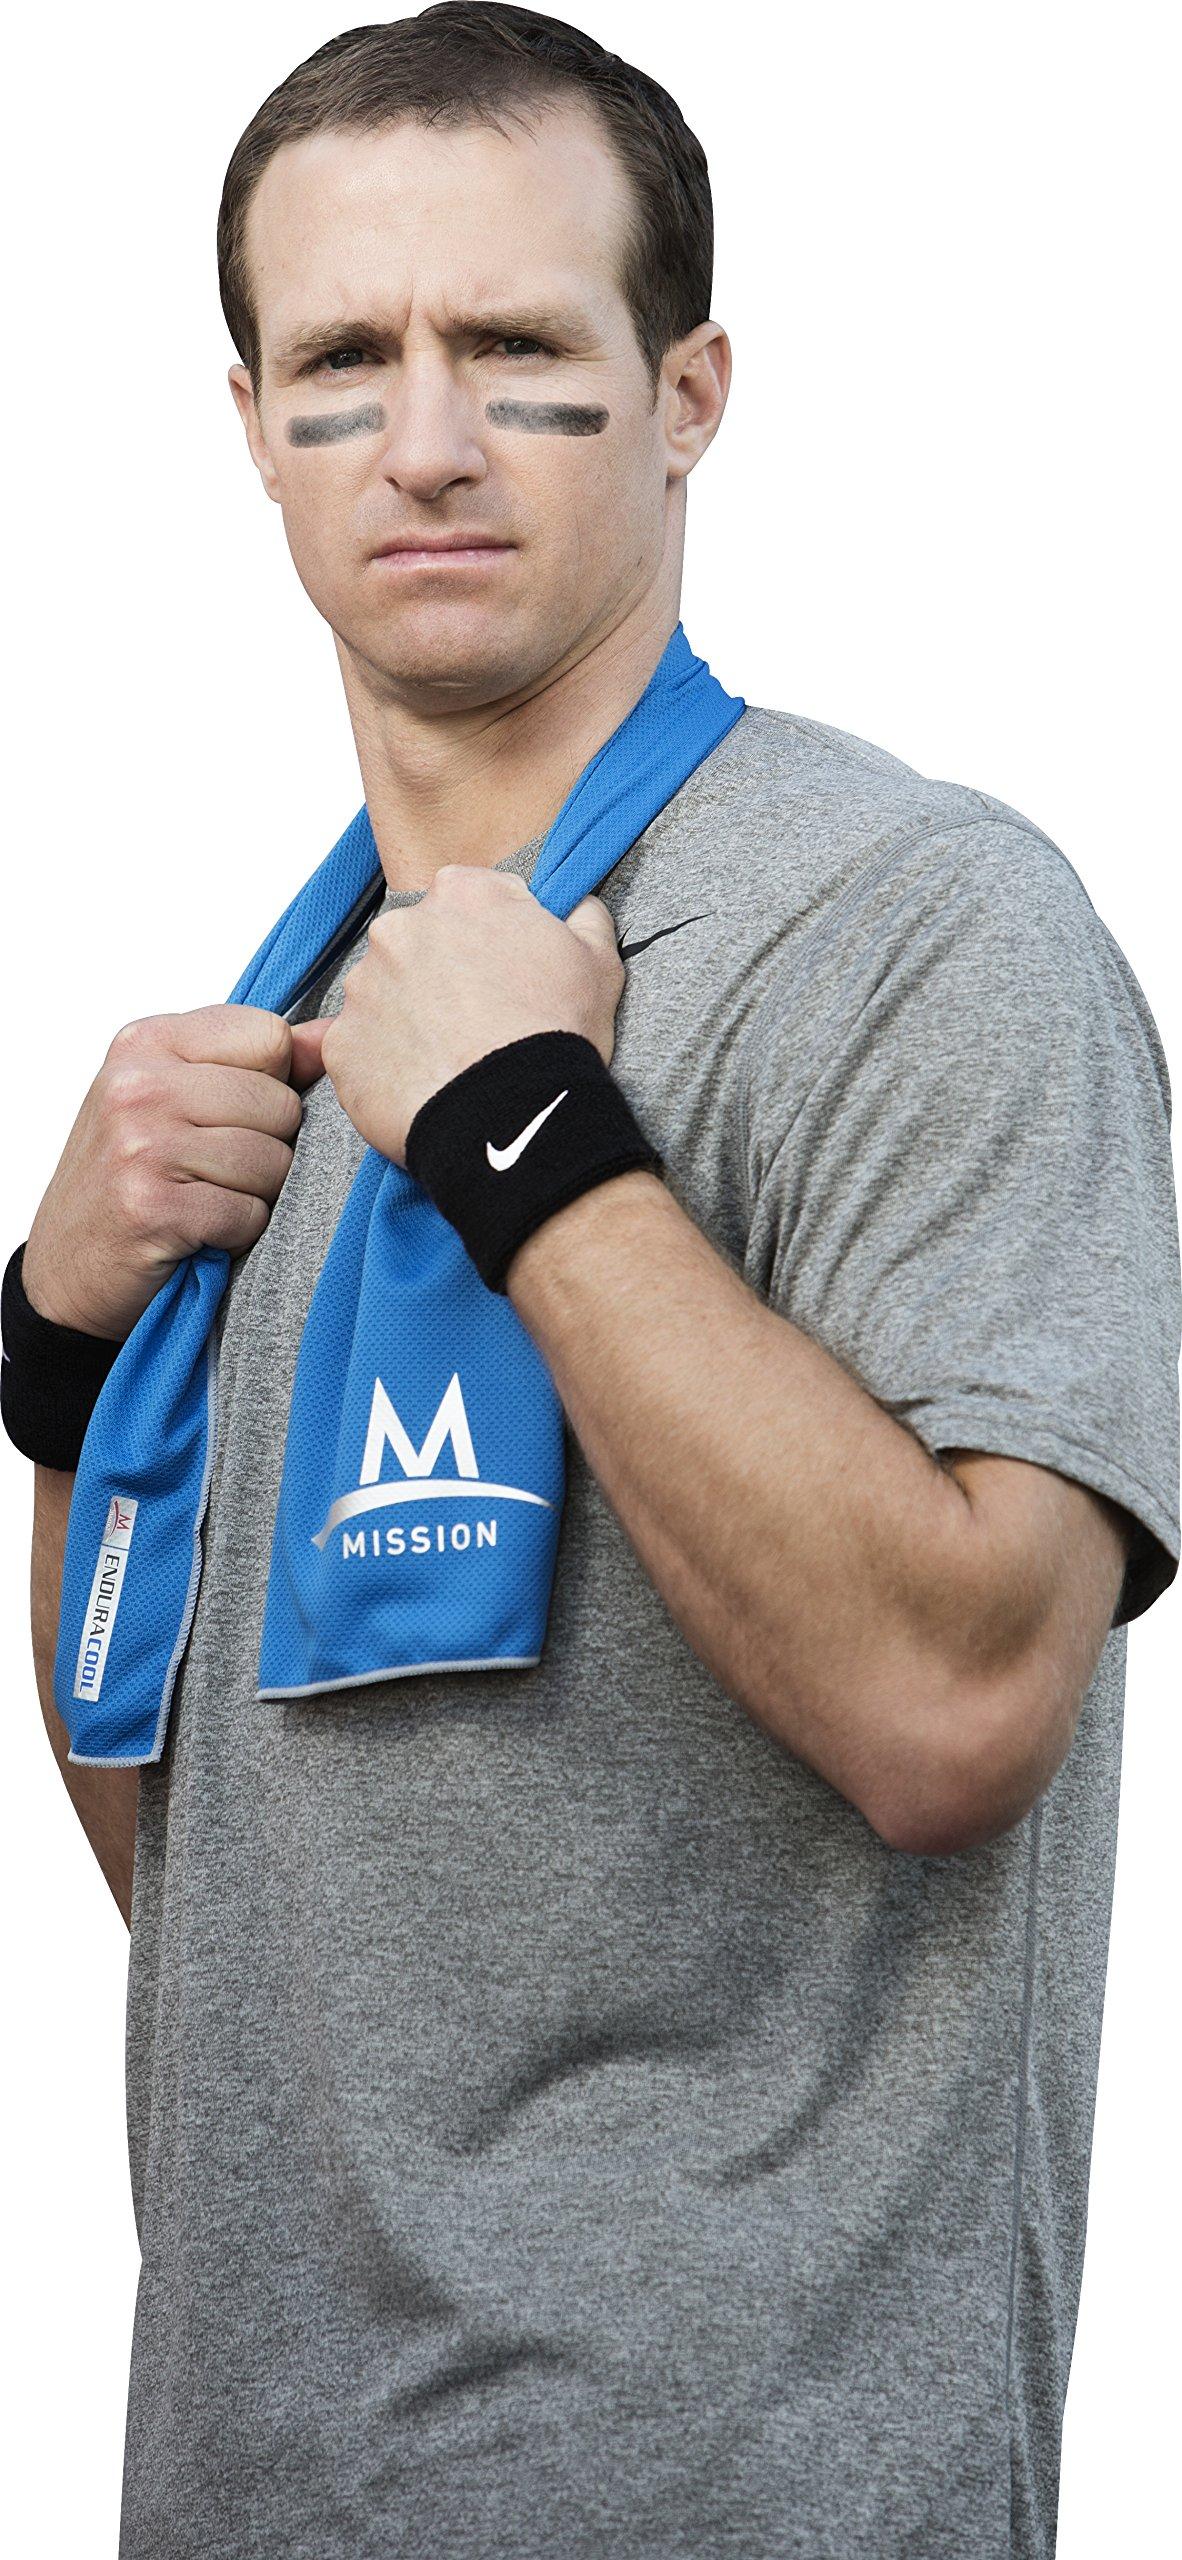 MISSION Premium Cooling Towel